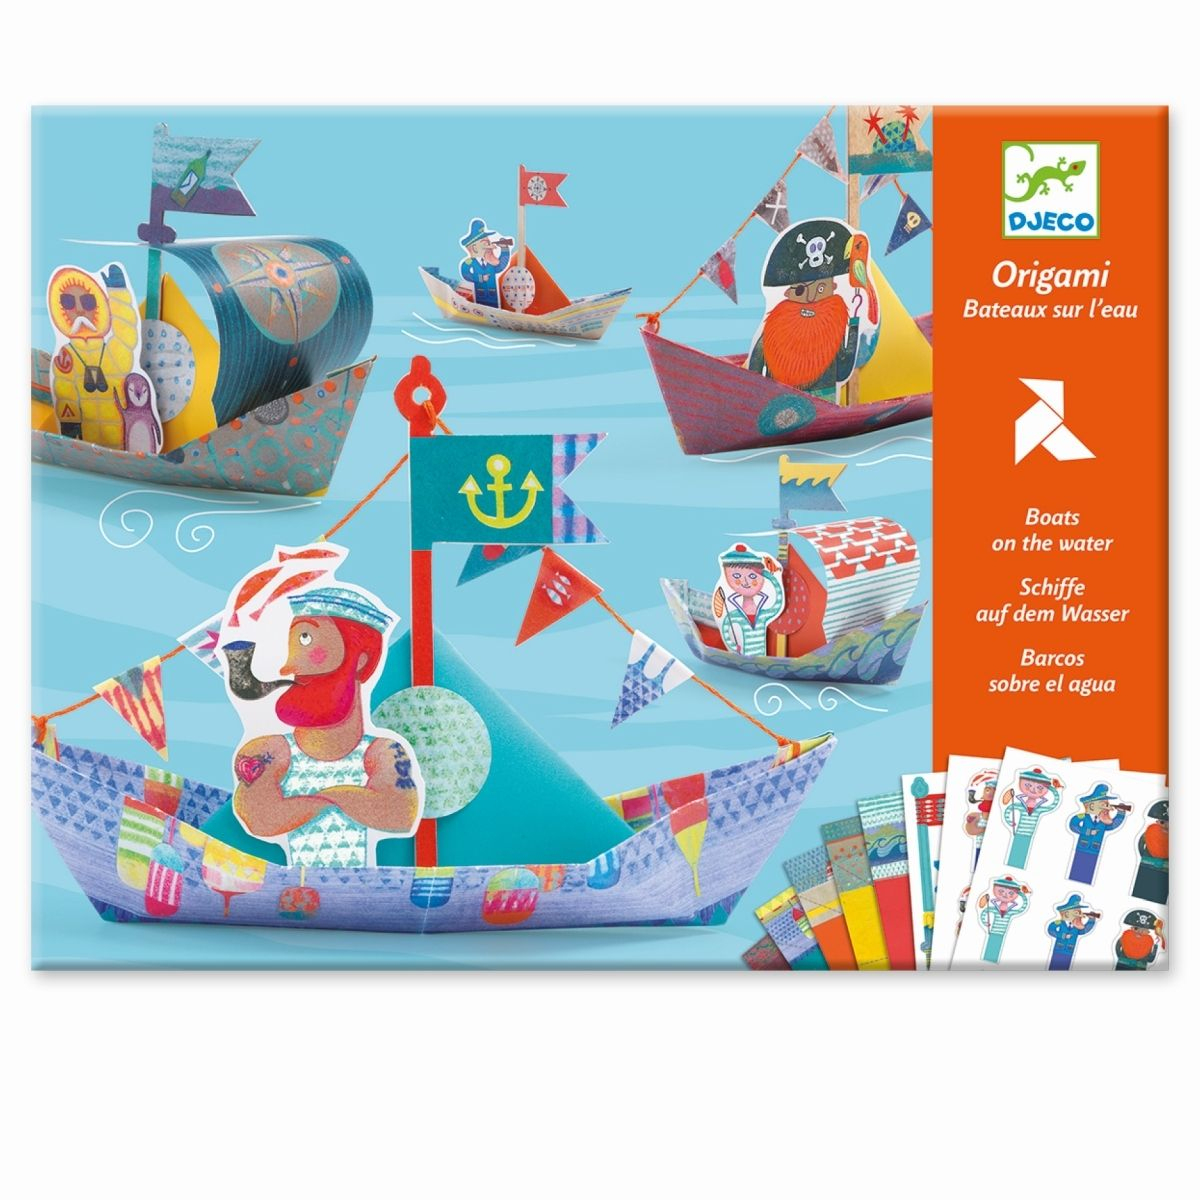 Origami: Origami Schiffe | Origami | Kleine Geschenke encequiconcerne Origami Petit Bateau